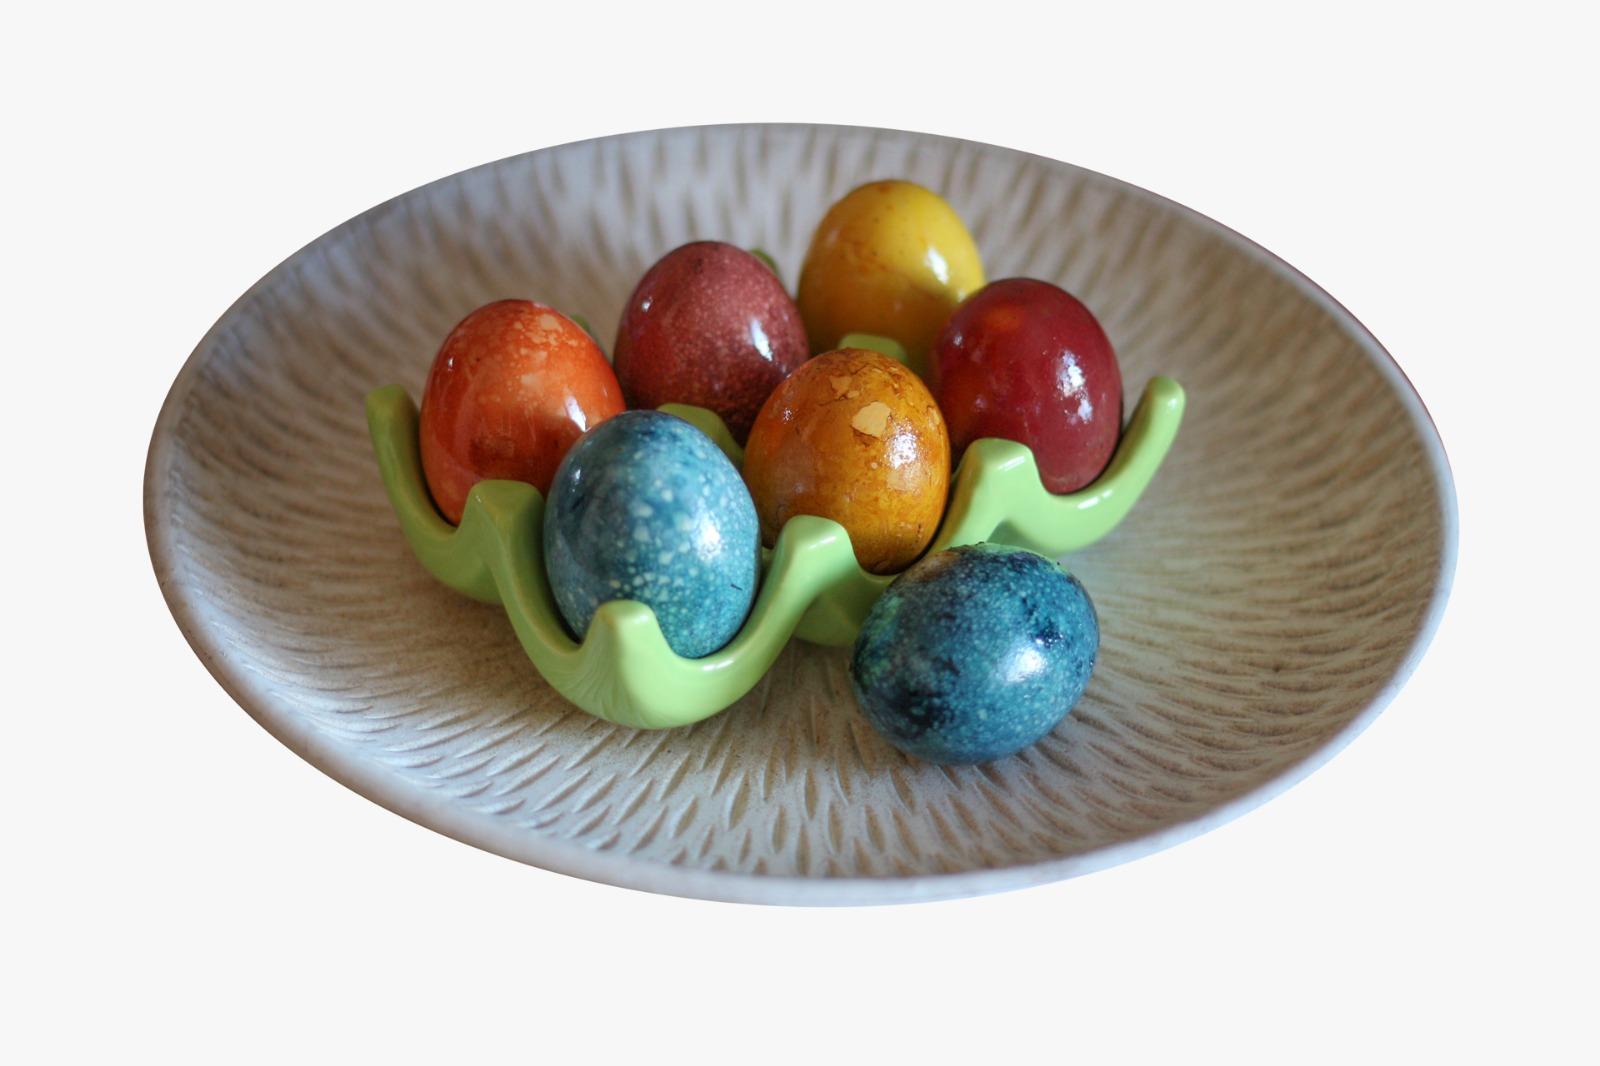 Naturalne barwniki do jajek